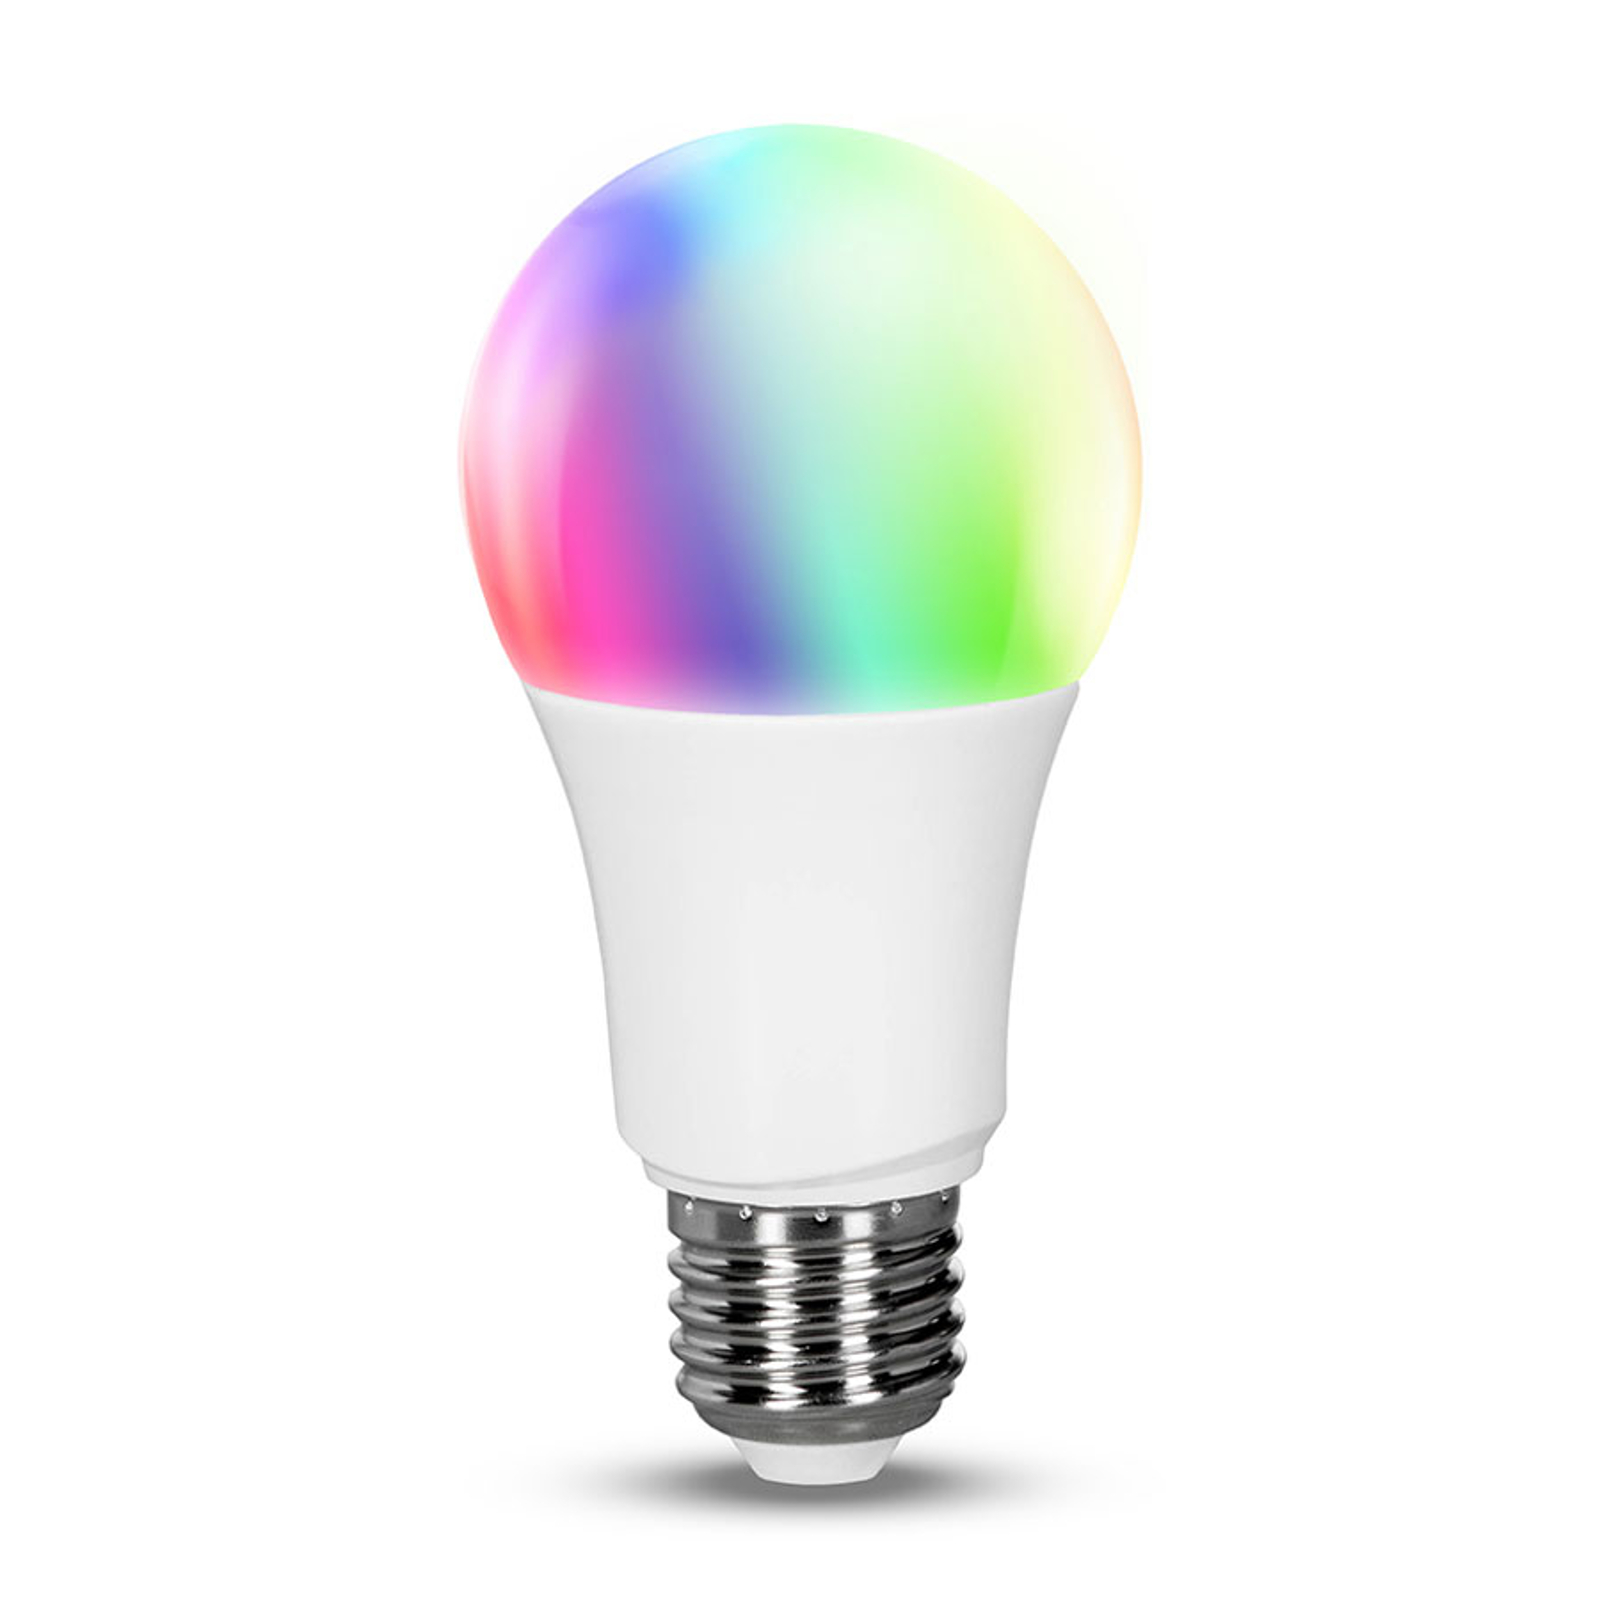 Müller Licht tint white+color żarówka LED E27 9,5W